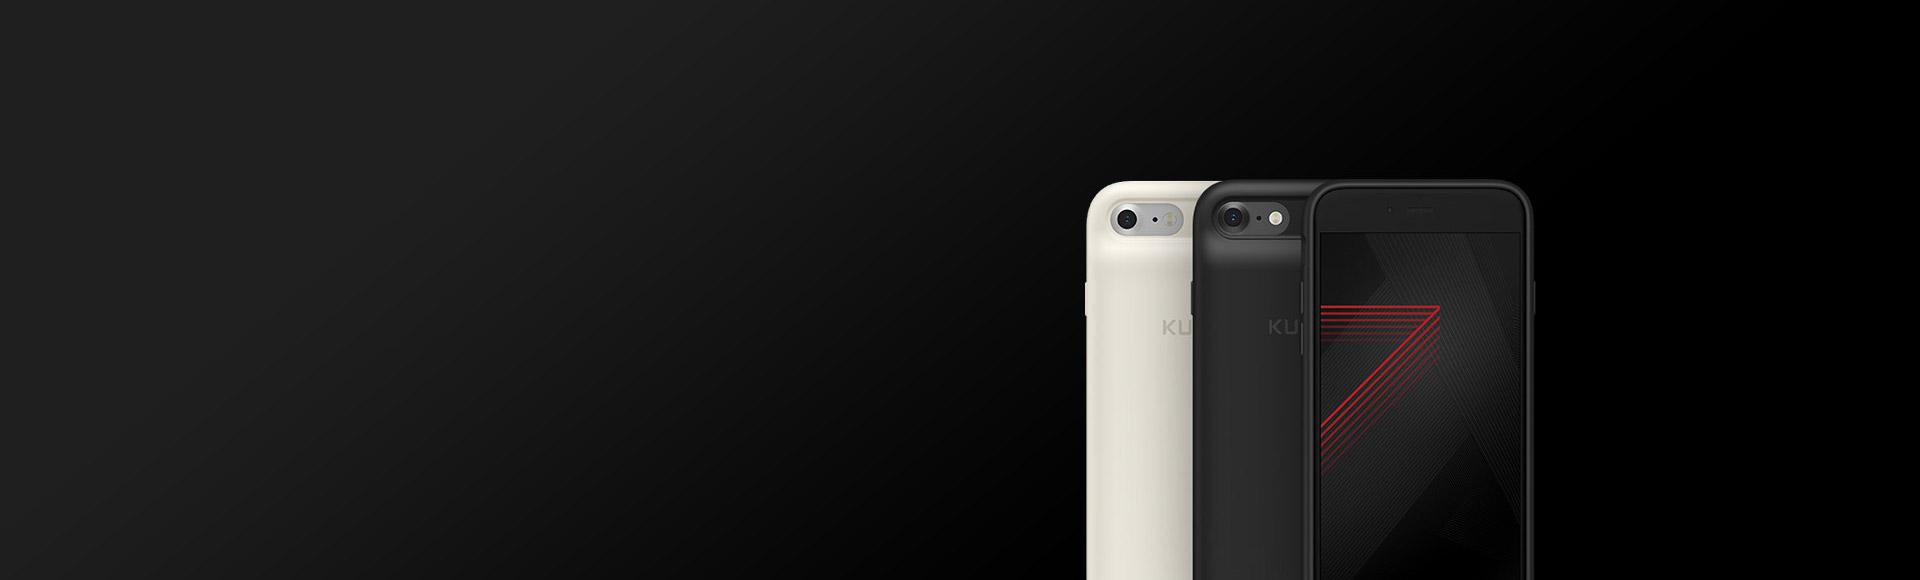 official photos ee981 44dd0 Kuner Kuke smart memory & battery case for iPhone